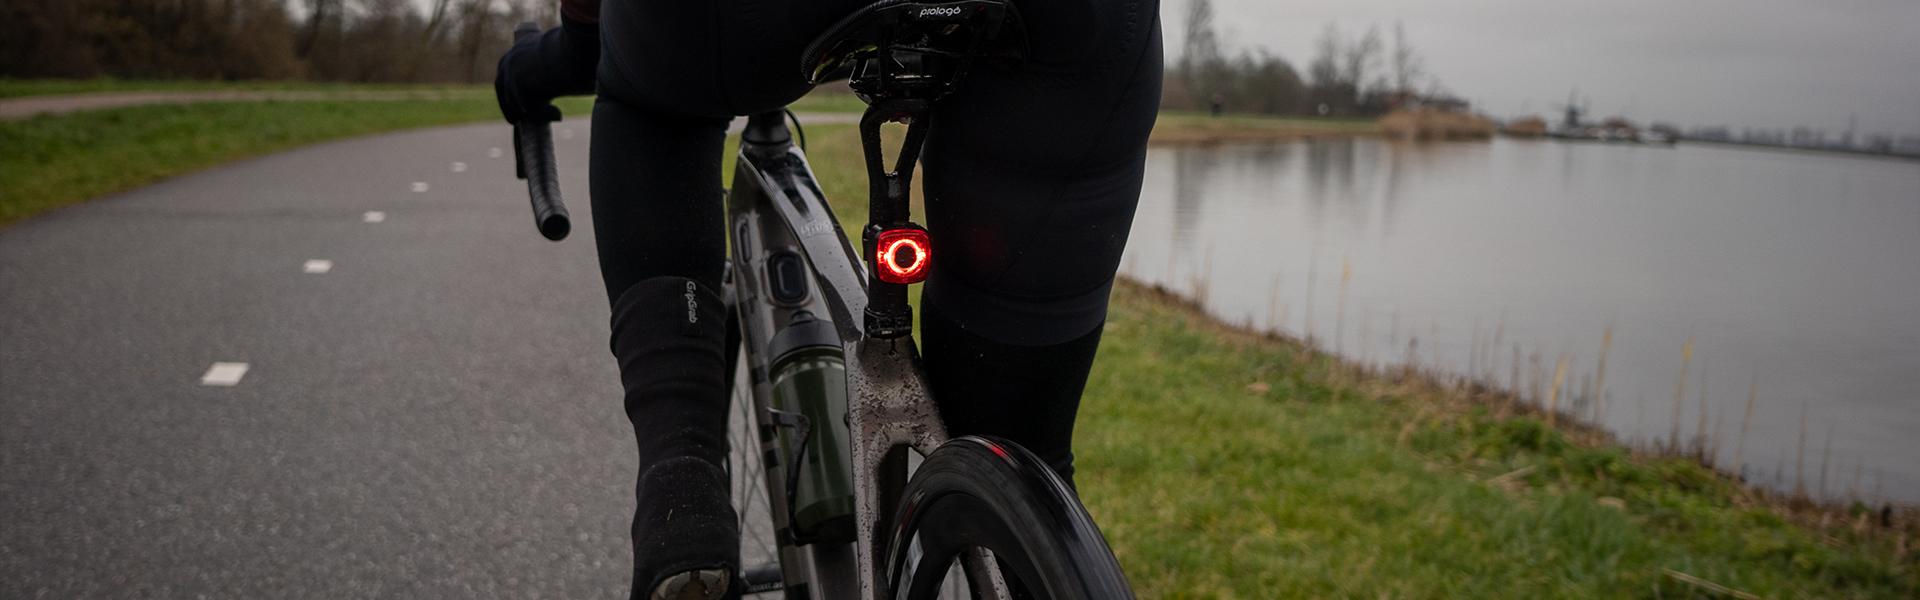 Sate-lite OSRAM 30lux ebike light ISO 6721-1 StVZO ECE eletric bike headlight with ECE ISO 6742-2 StVZO reflector front fork 6-58V